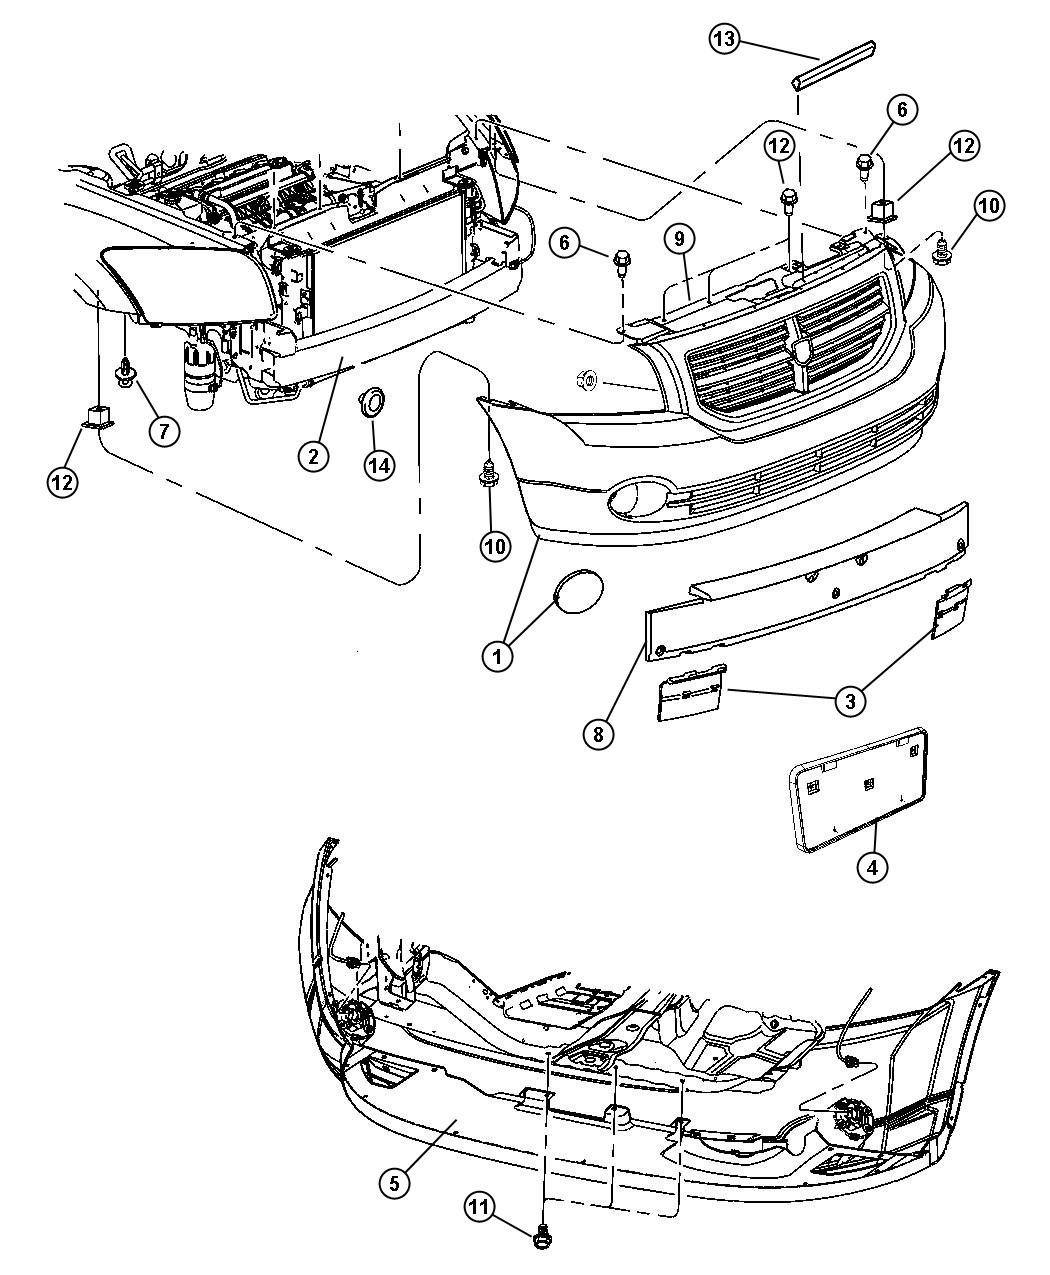 Diagram 1992 Dodge Parts Diagram Full Version Hd Quality Parts Diagram Electriwiring Media90 It